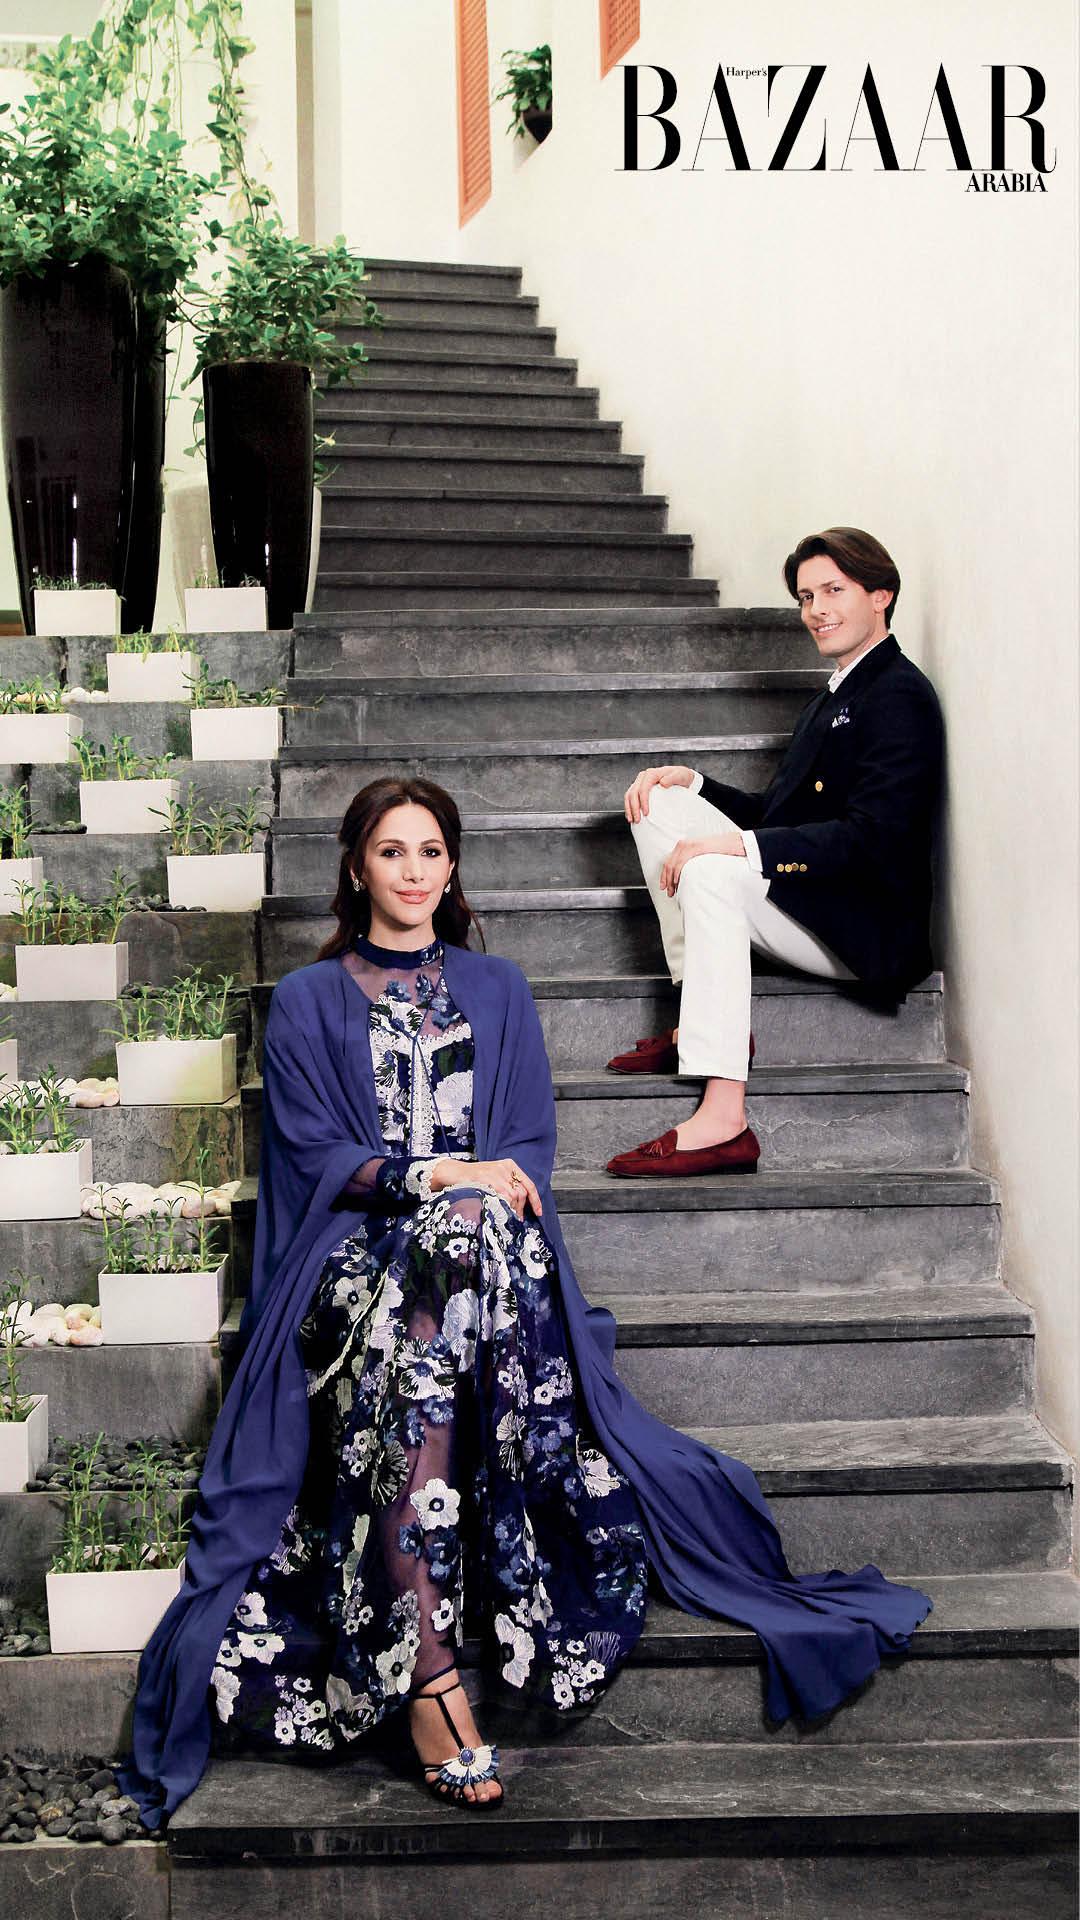 Sheikha Raya Al-Khalifa And Aquazurra's Edgardo Osorio discuss all things fashion in Qatar